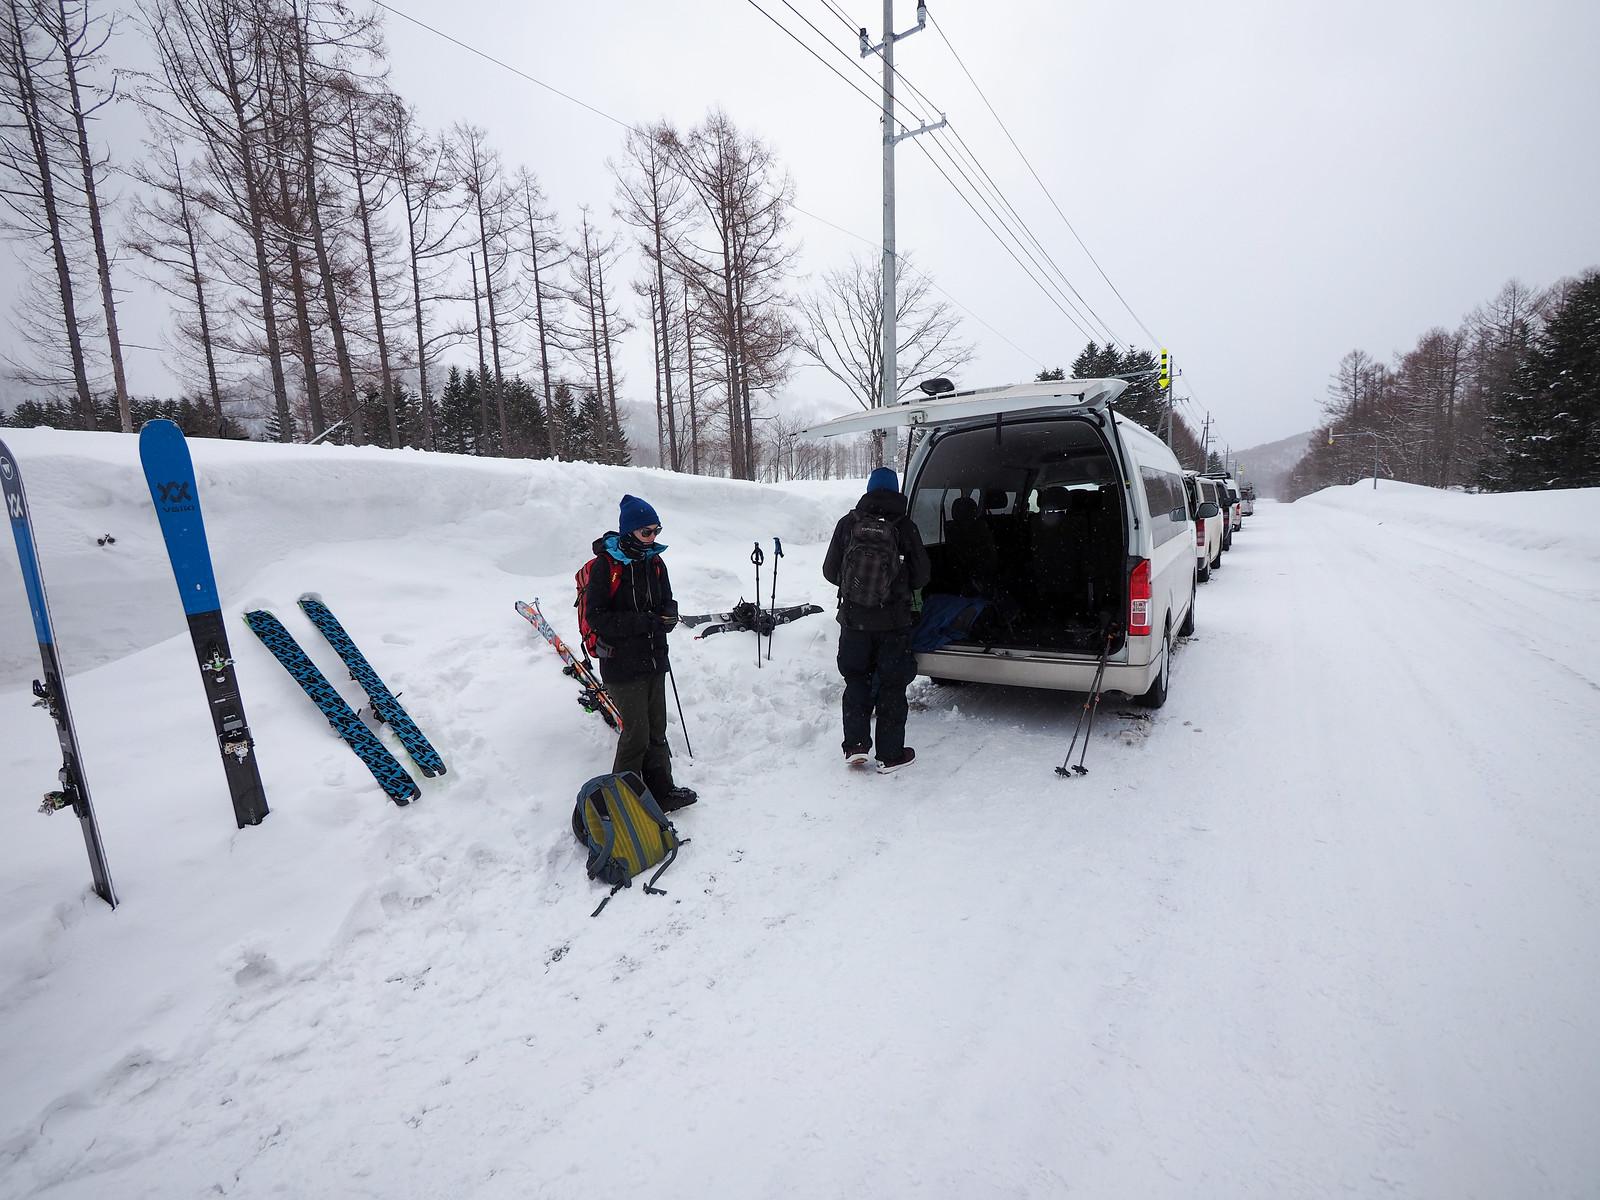 Whiteroom Tours AST2 Avalanche Safety Training Course (Niseko, Hokkaido, Japan)